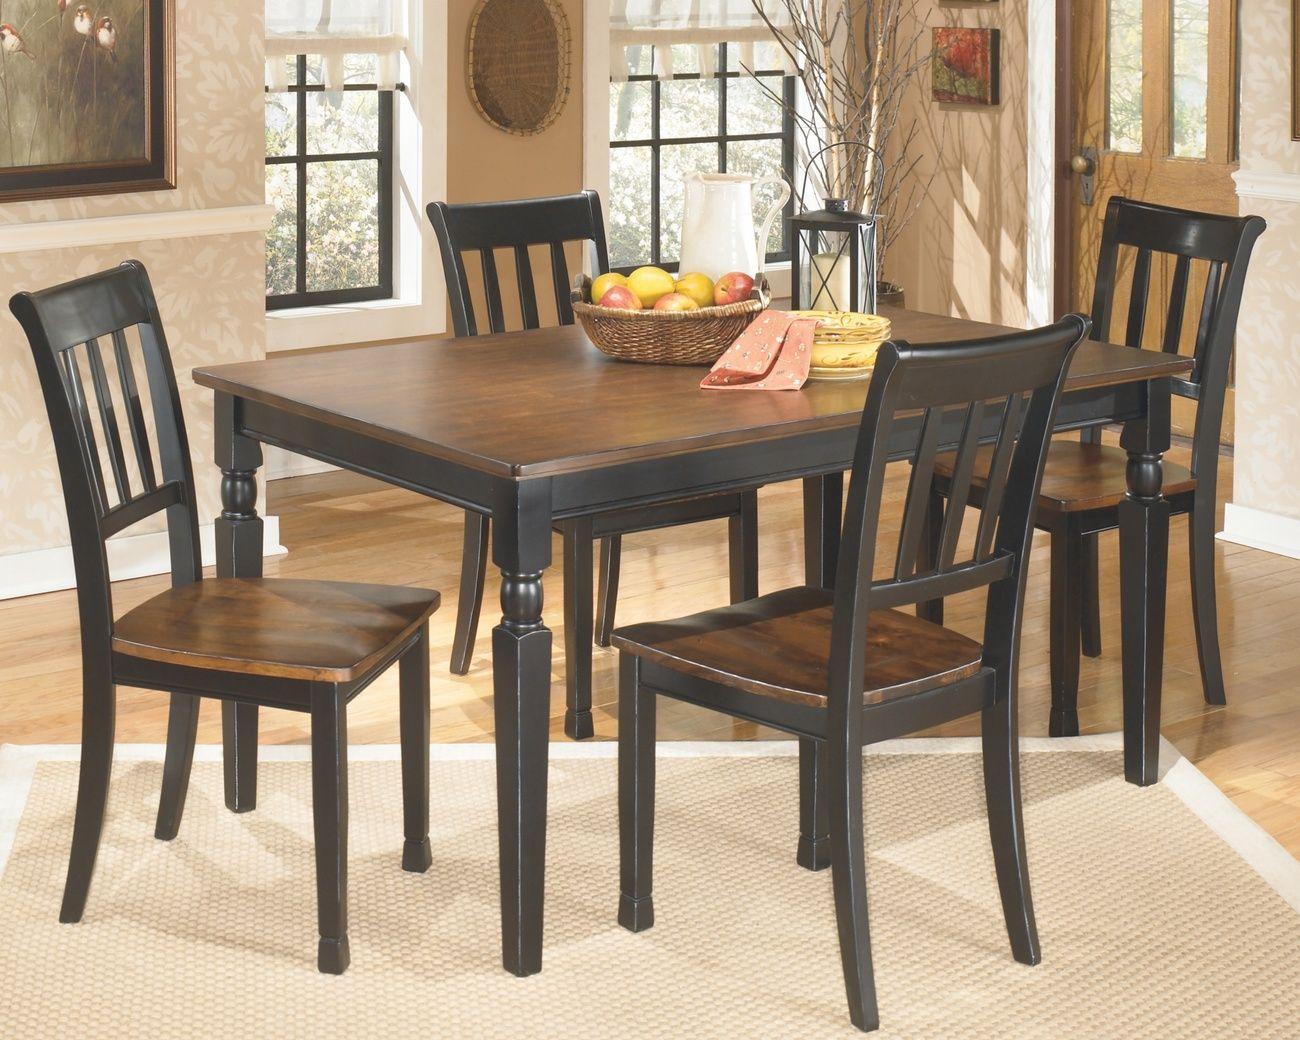 Signature Design Owingsville Rectangular Dining Room Table Only Ashley Furniture D580 25